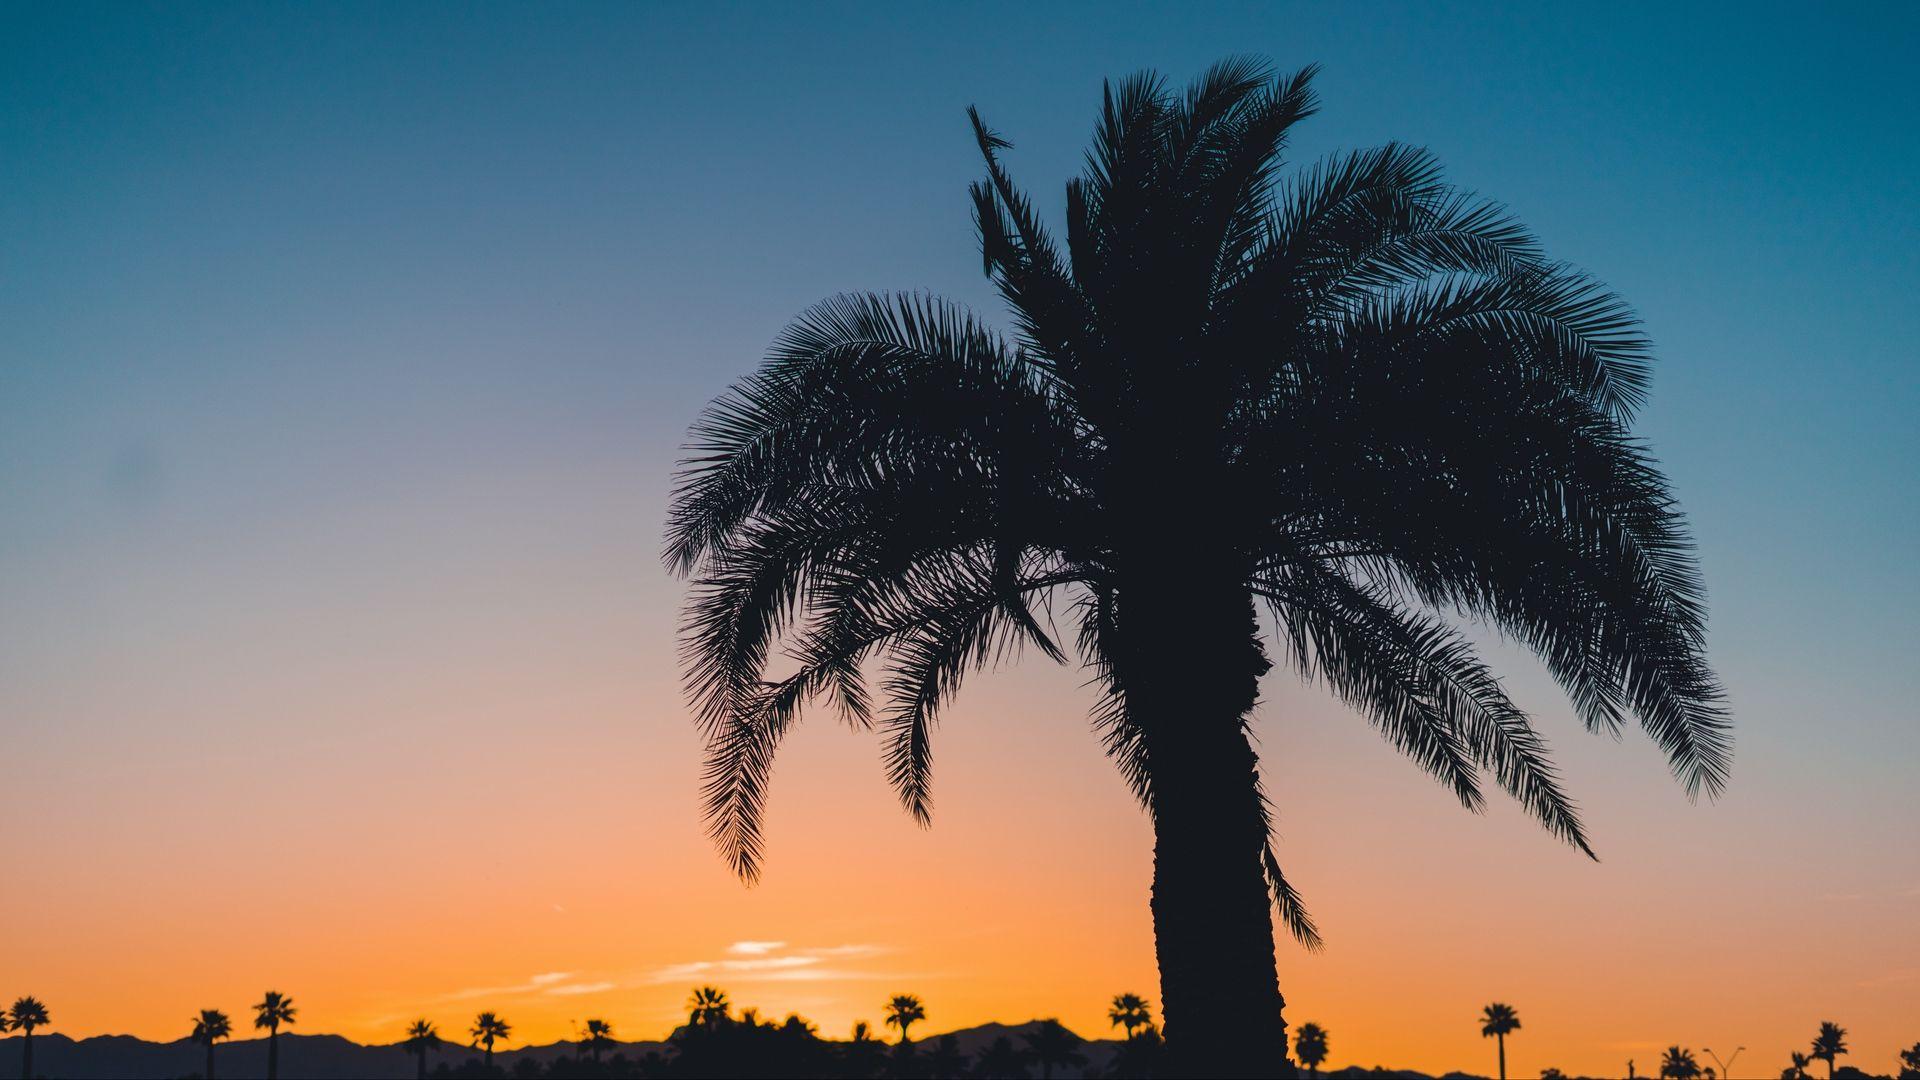 Palm Tree Sunset nice wallpaper